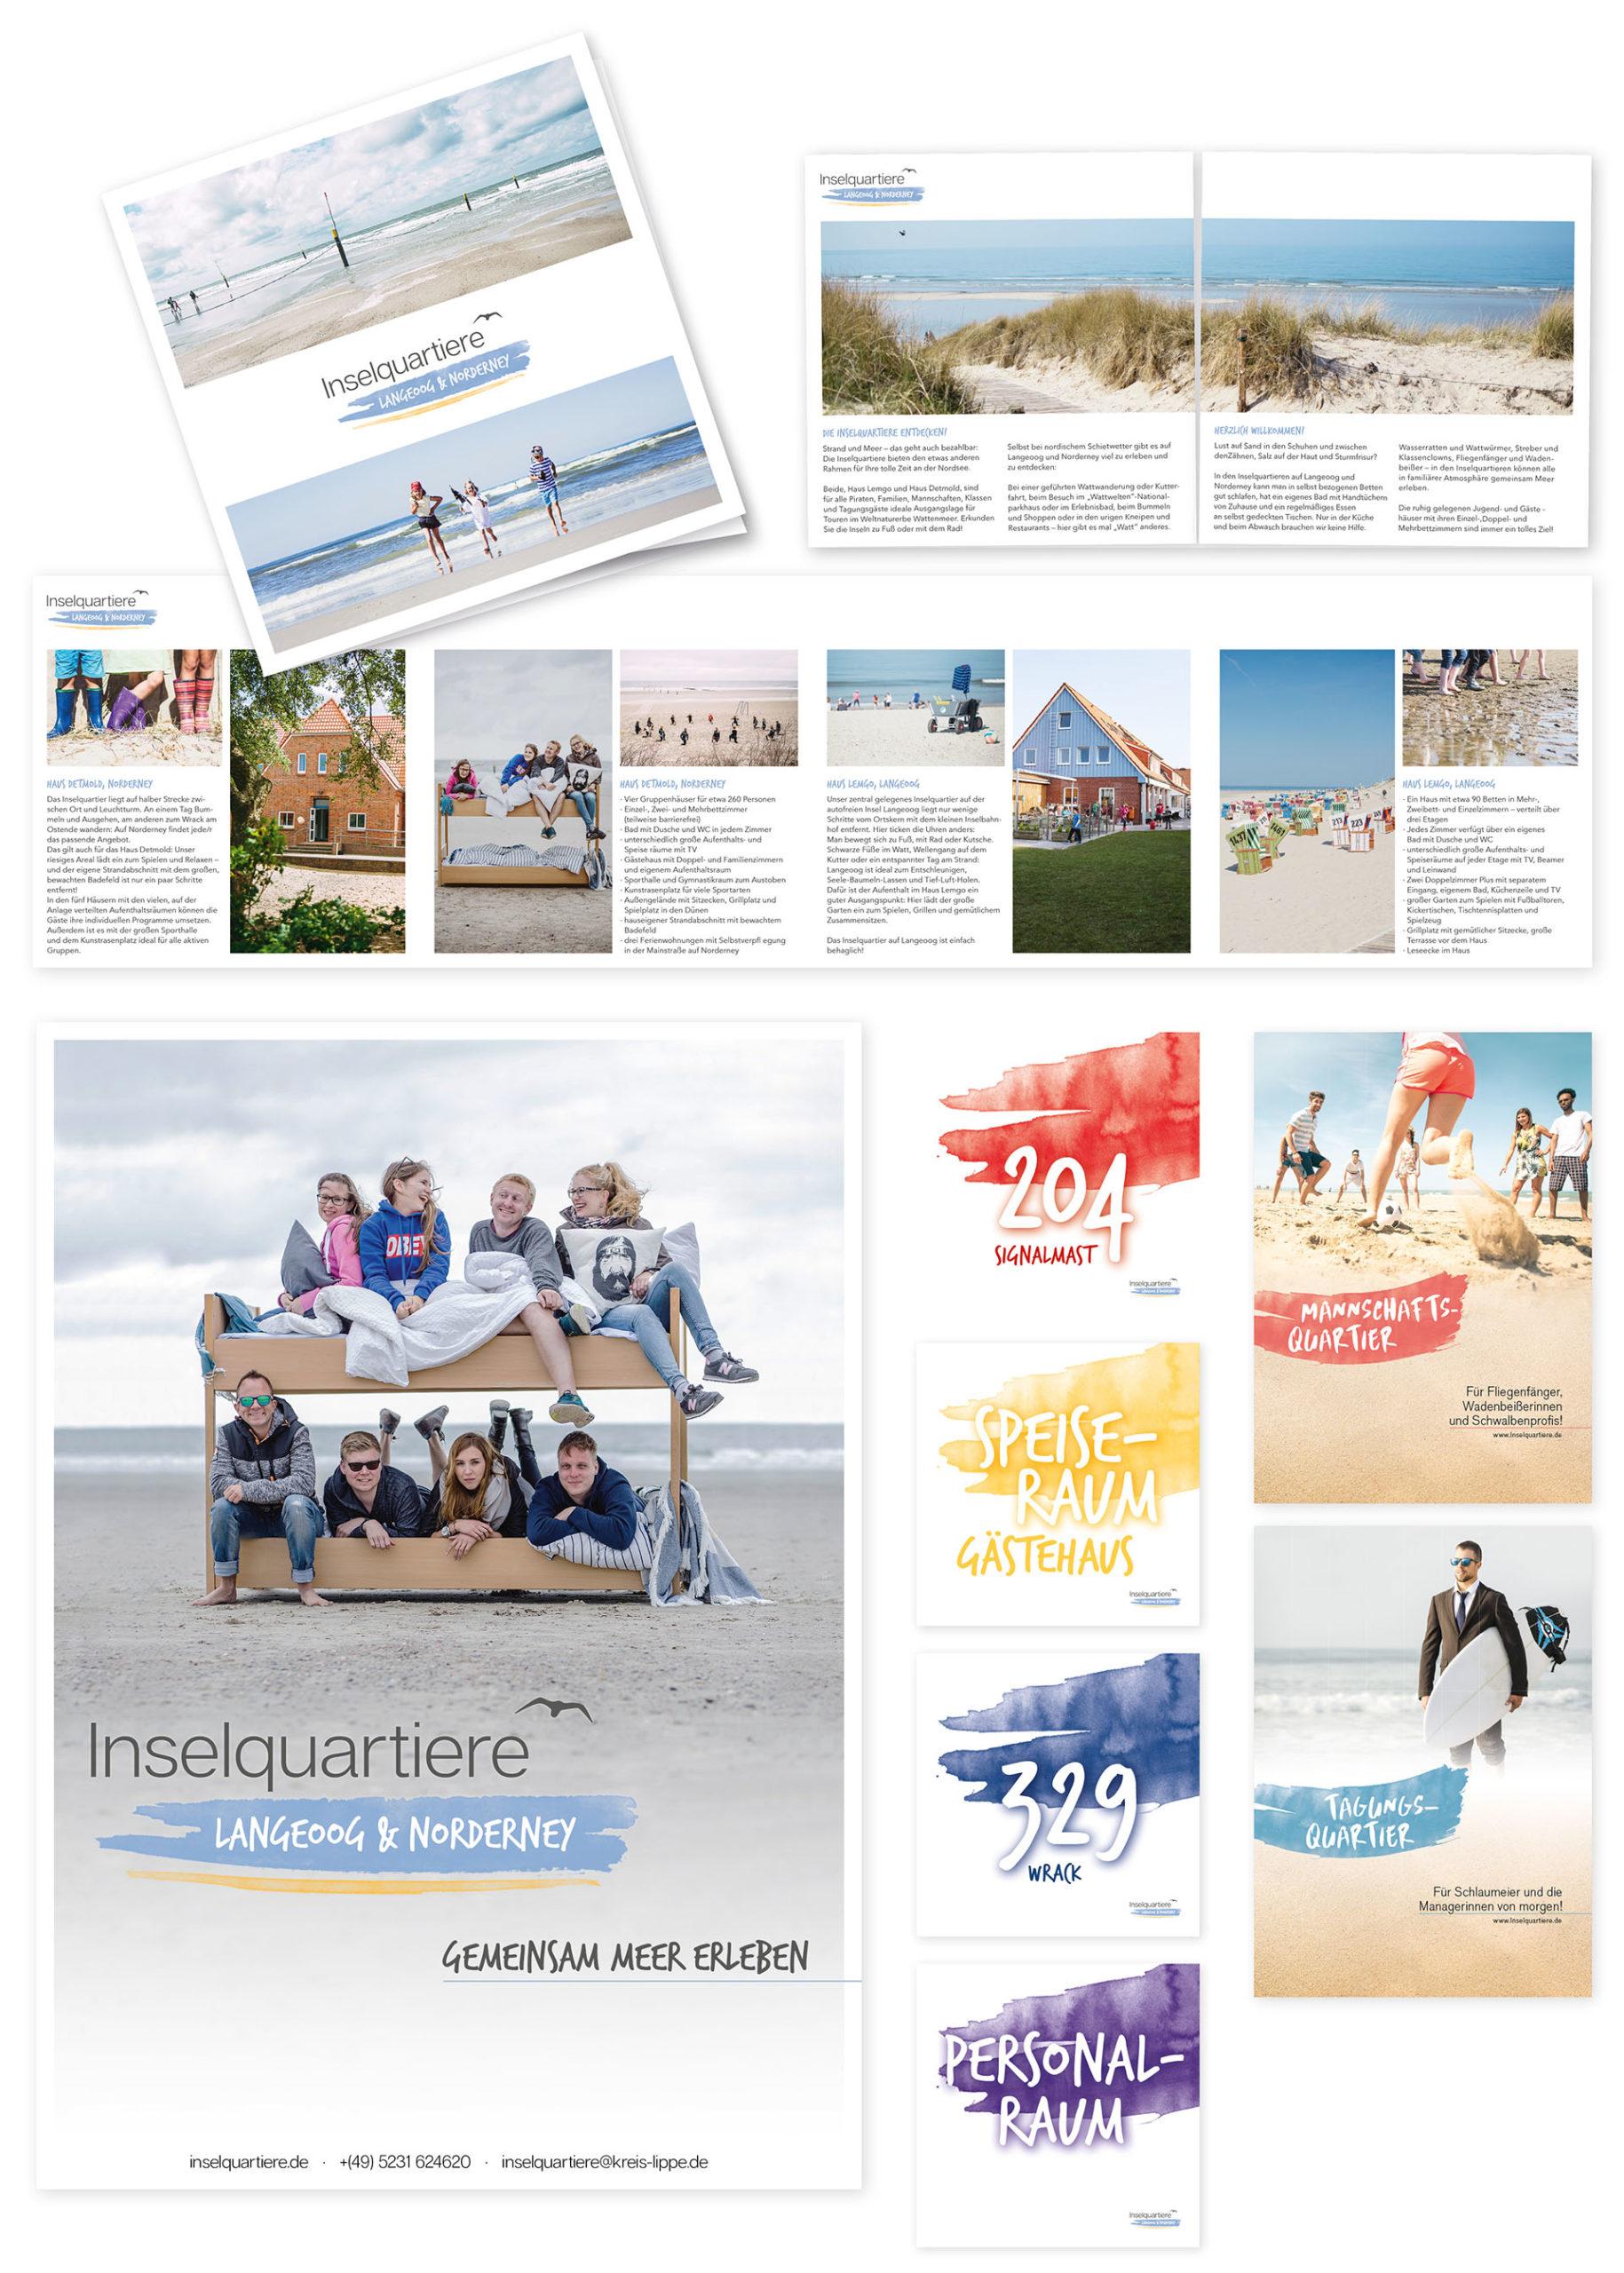 Kreis Lippe Martina Olonschek Corporate Design Collage